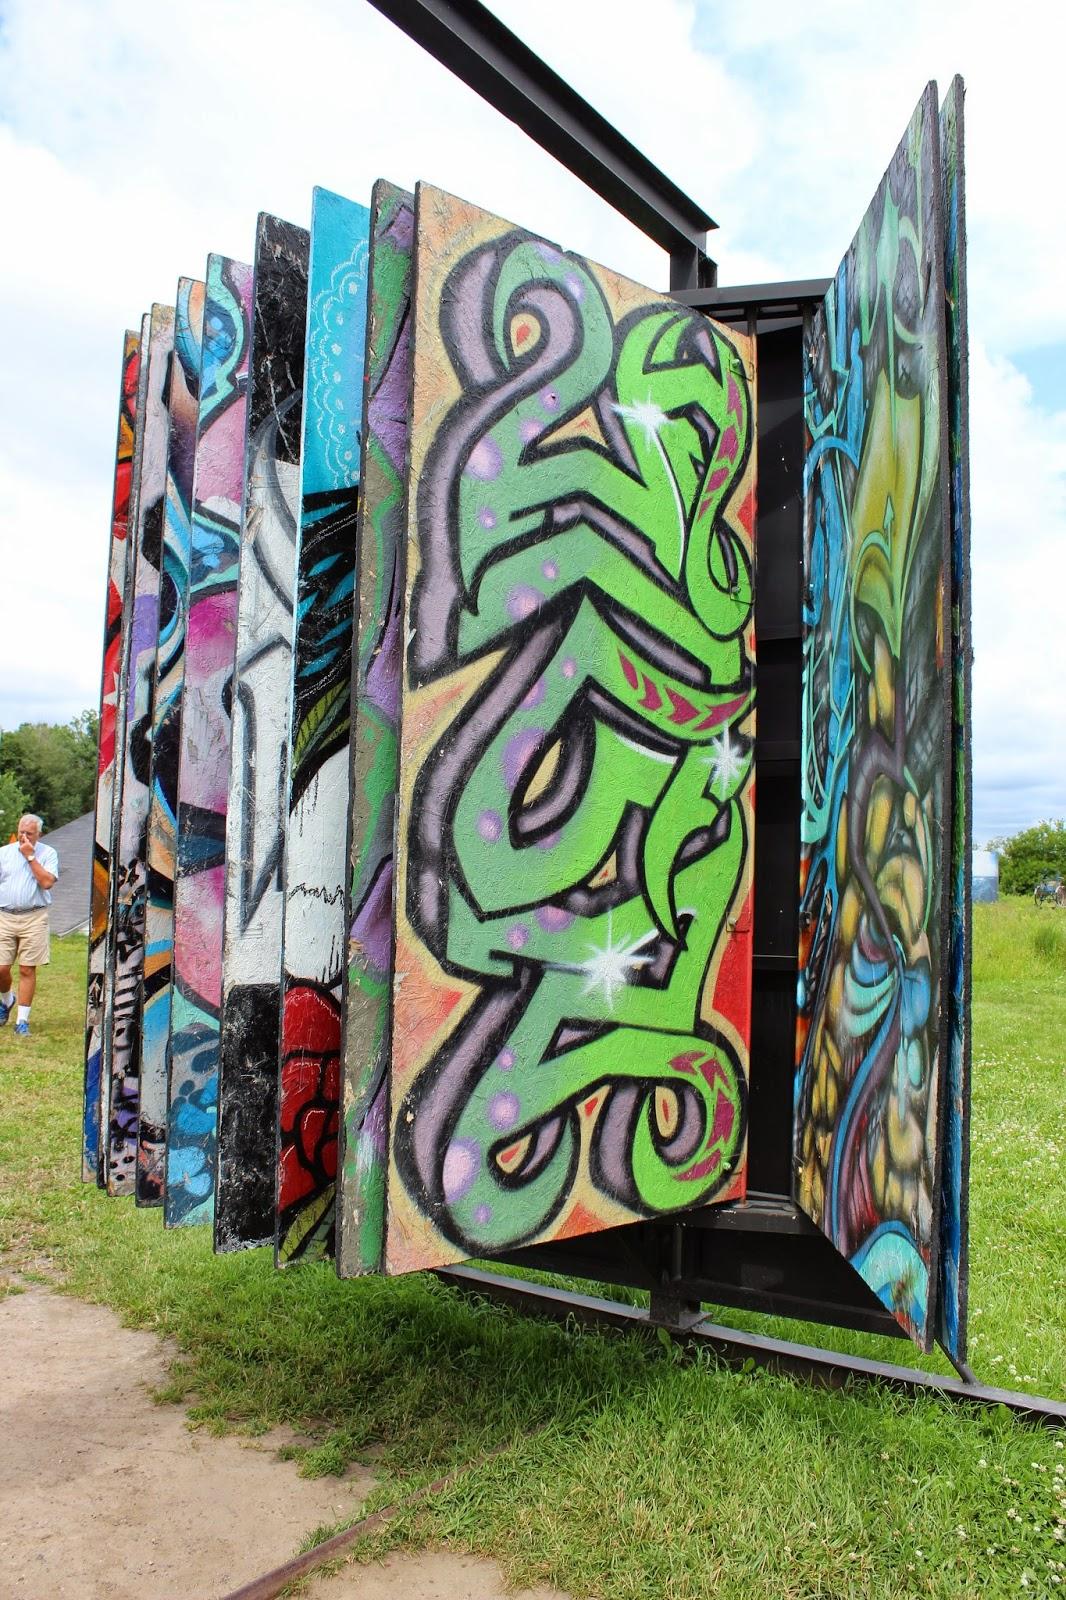 Graffiti wall rubric - Organized Graffiti